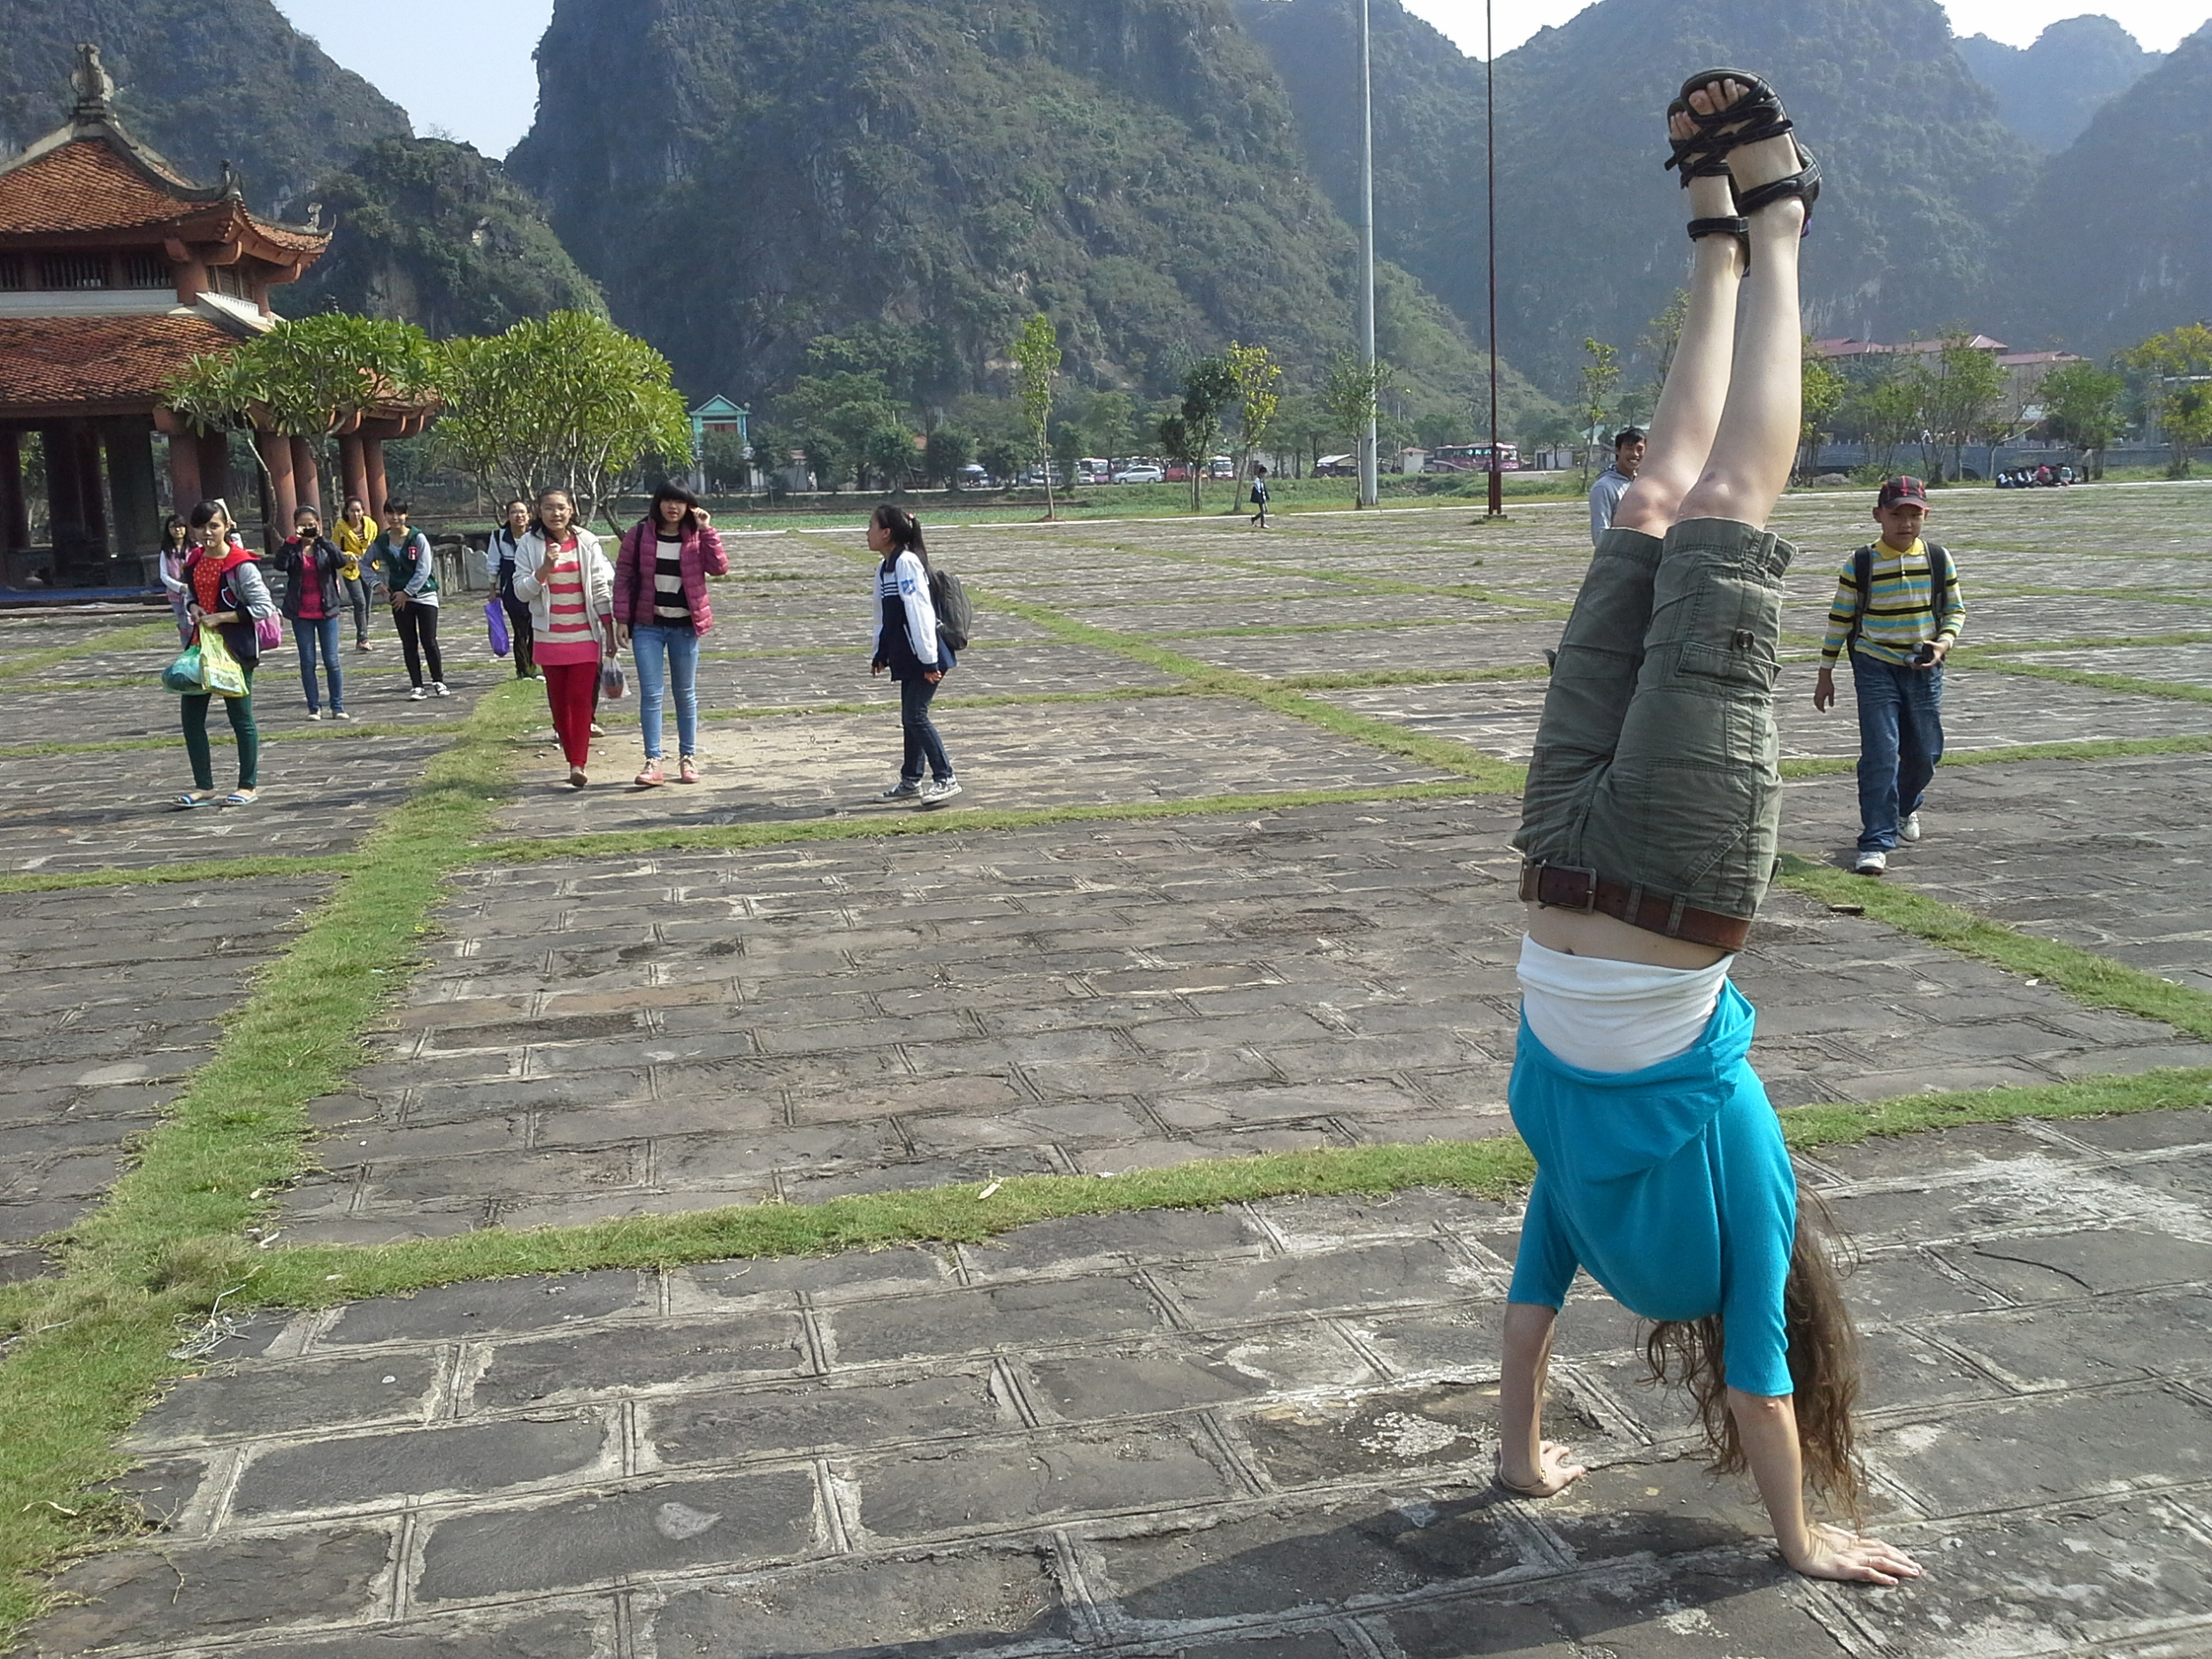 Being playful in Vietnam drew attention and interest of nearby school children.